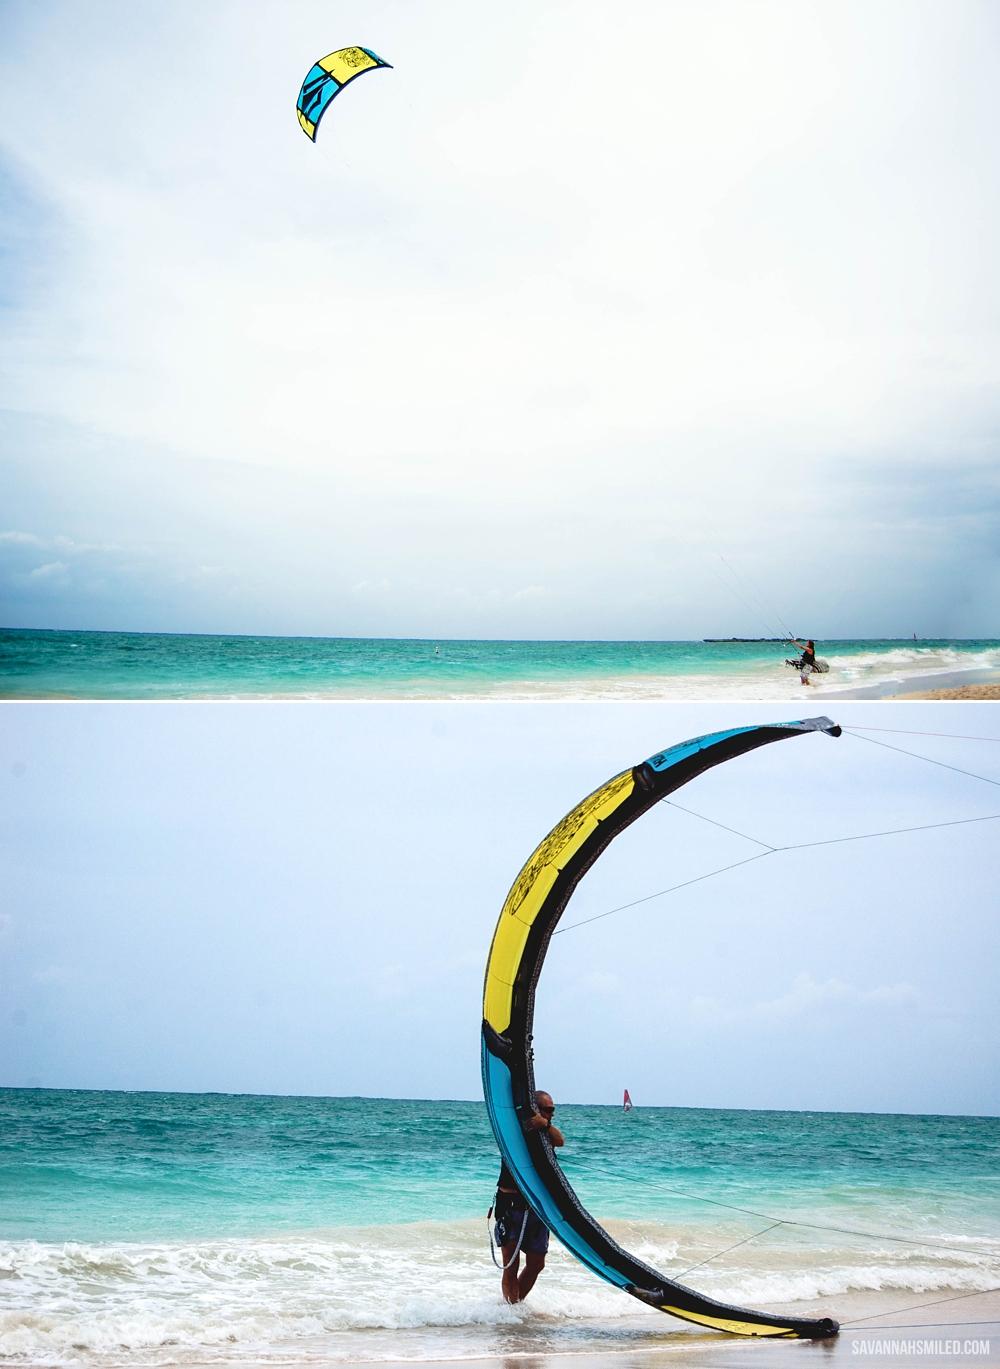 kailua-beach-hawaii-waves-water-5.jpg